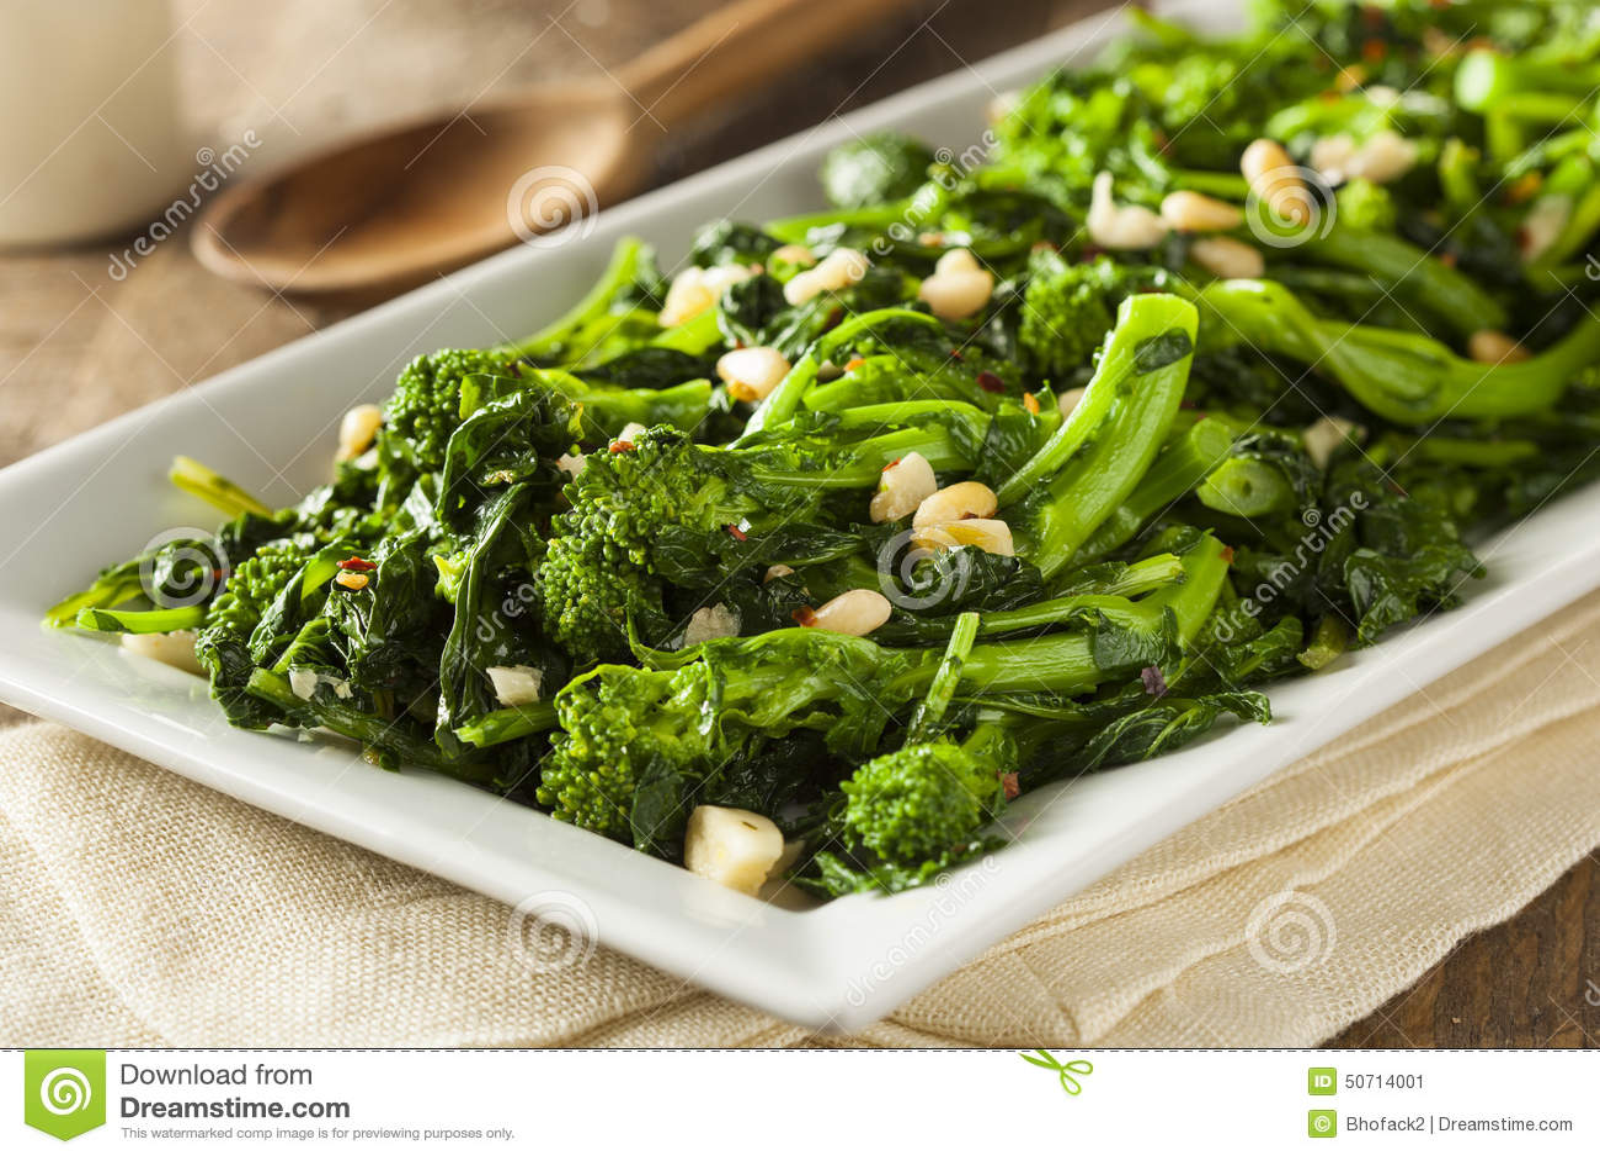 Brocoli vert sauté fait maison Rabe